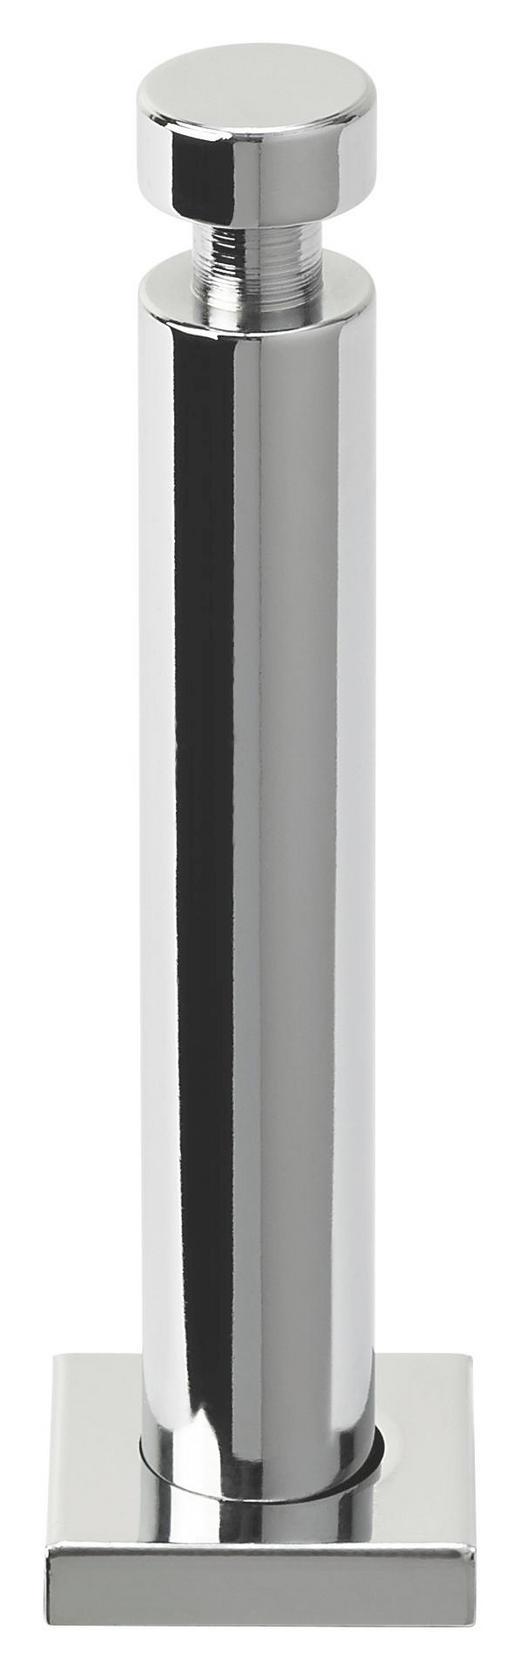 GARDEROBENHAKEN Chromfarben - Chromfarben, Design, Metall (4/4/15cm)